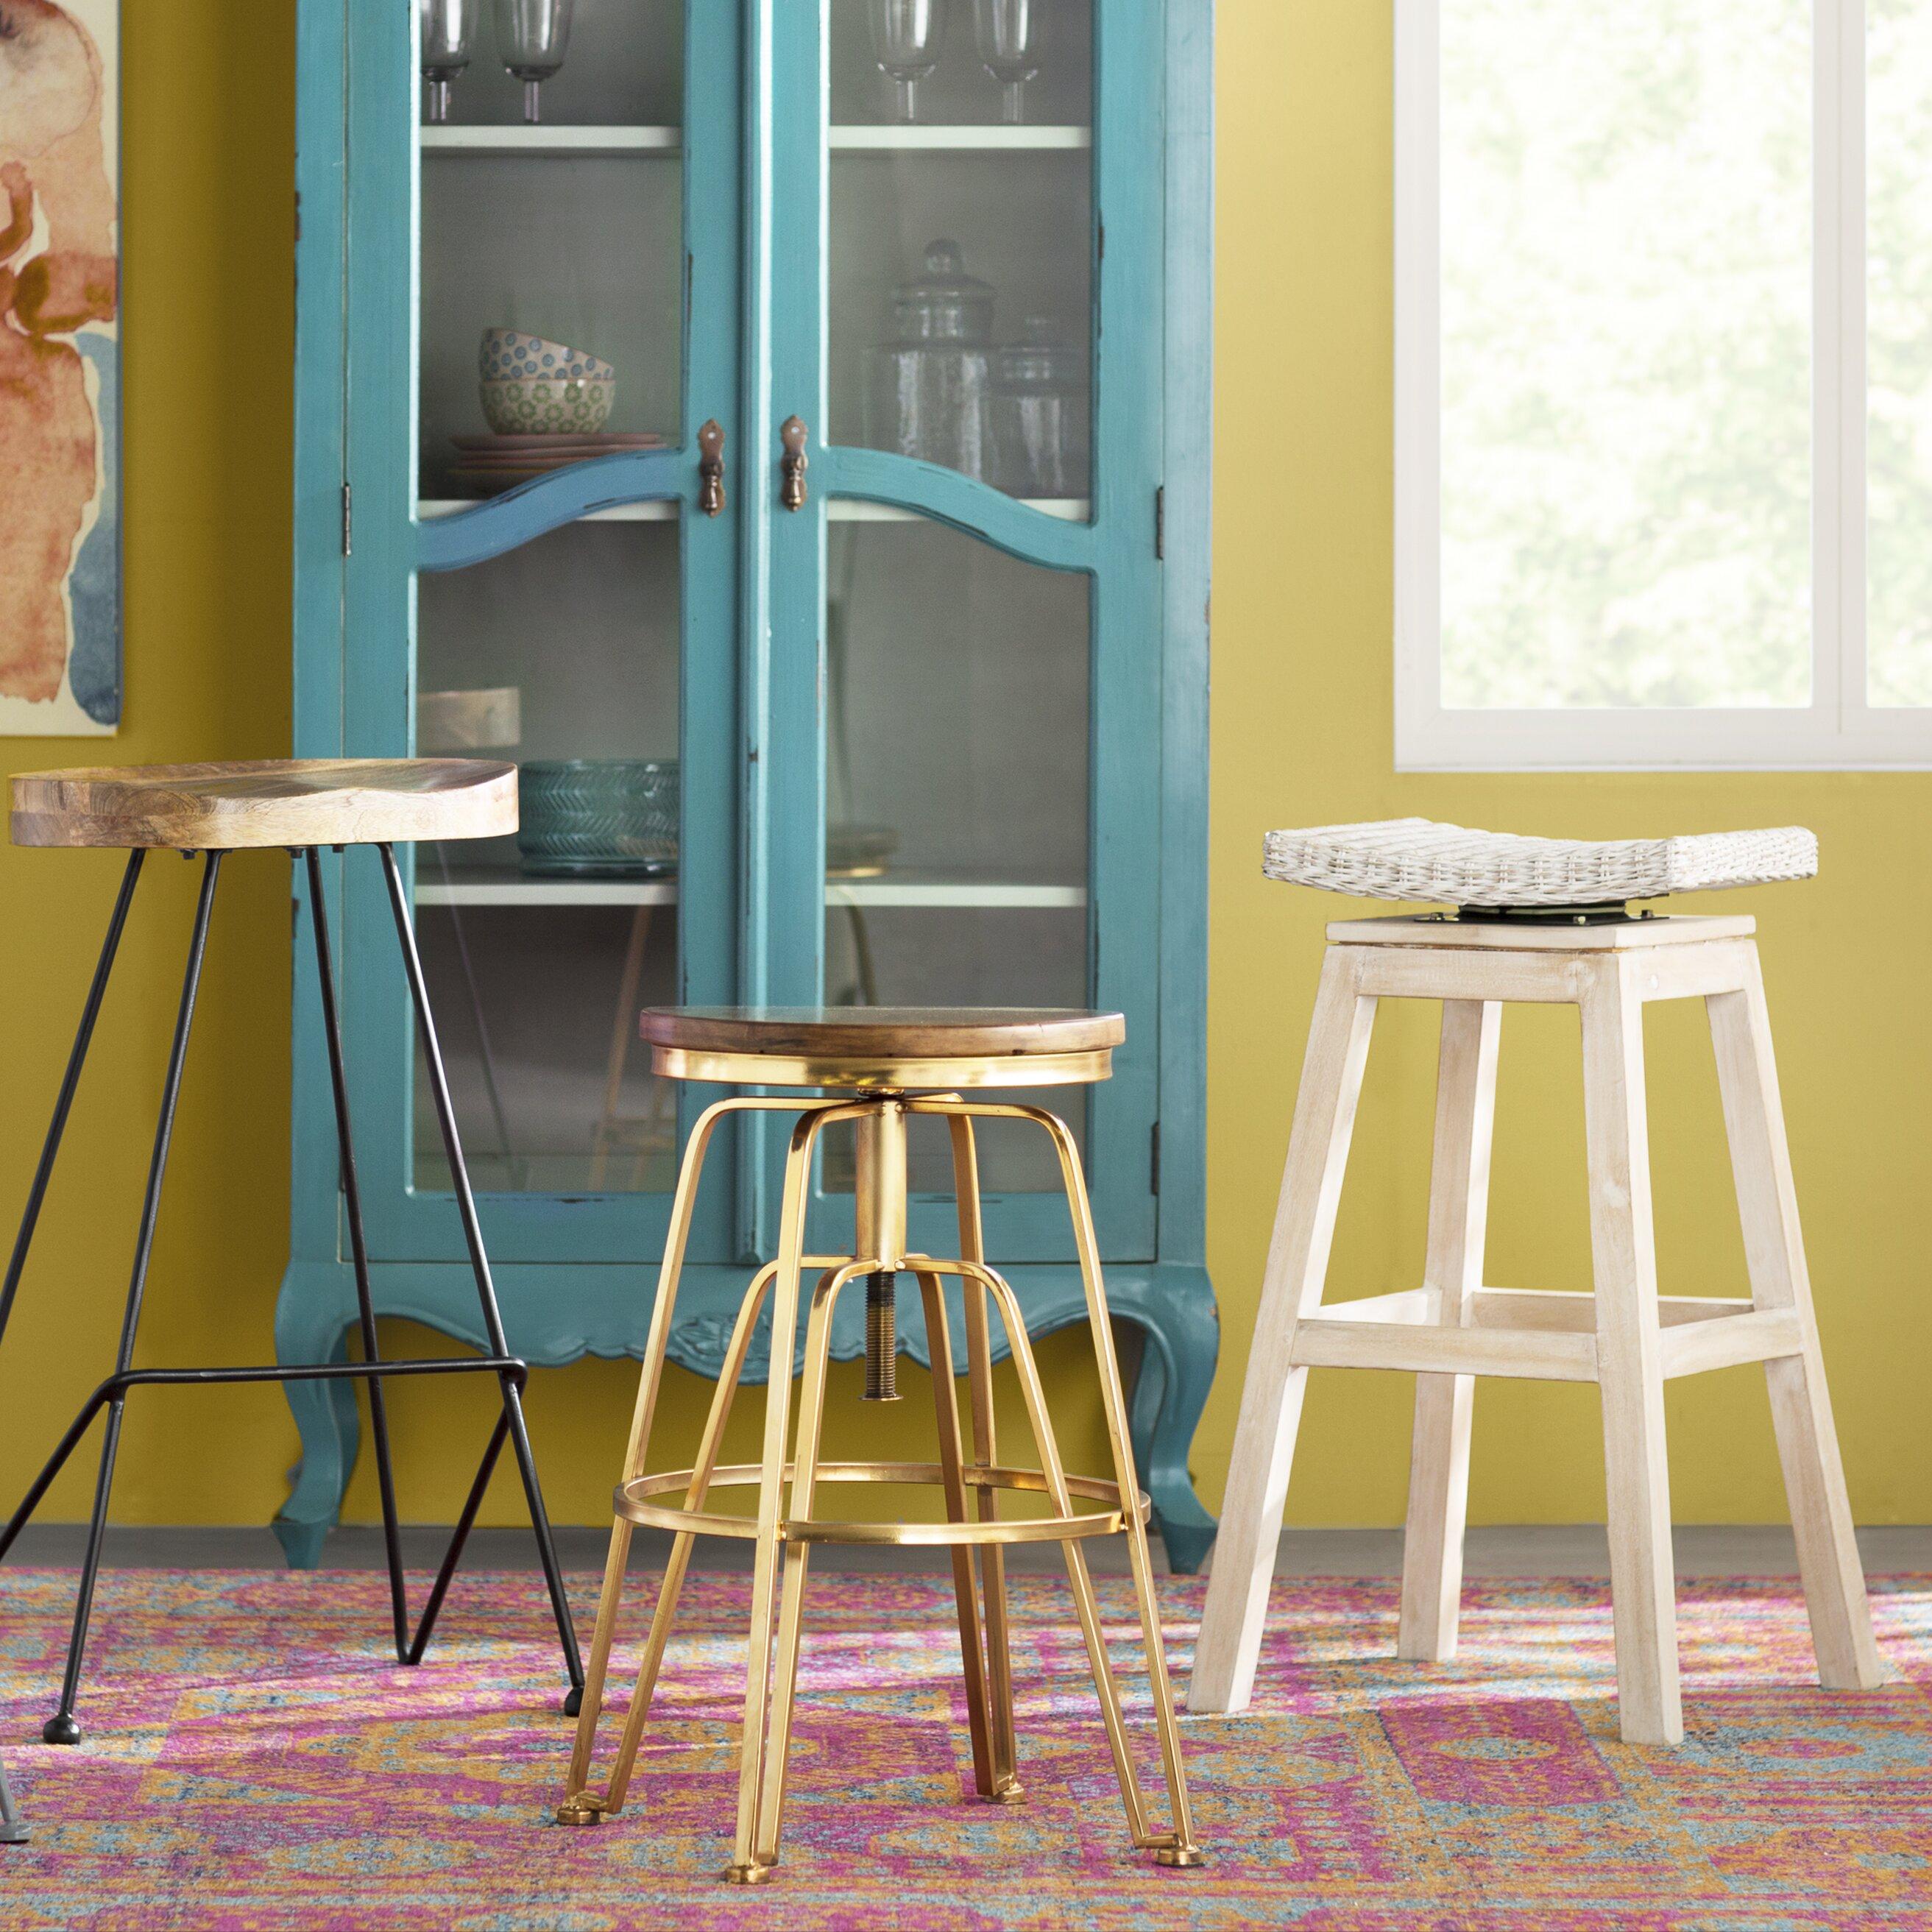 image quarter bamboo bathroom stool bungalow rose rinelle ampquot  bungalow rose rinelle  swivel bar stool